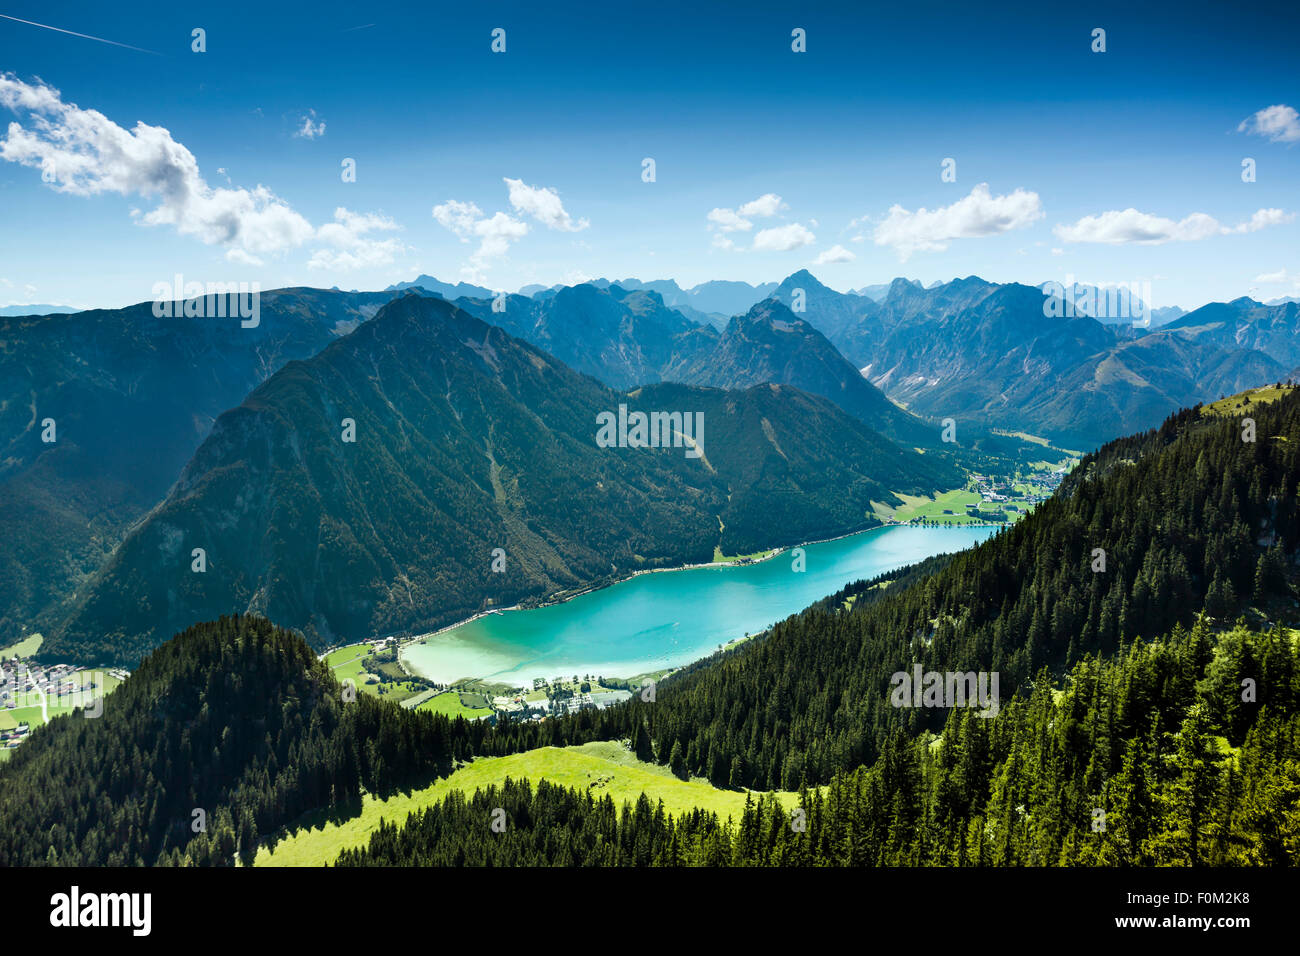 Achen Lake and Karwendel mountains, Tyrol, Austria - Stock Image